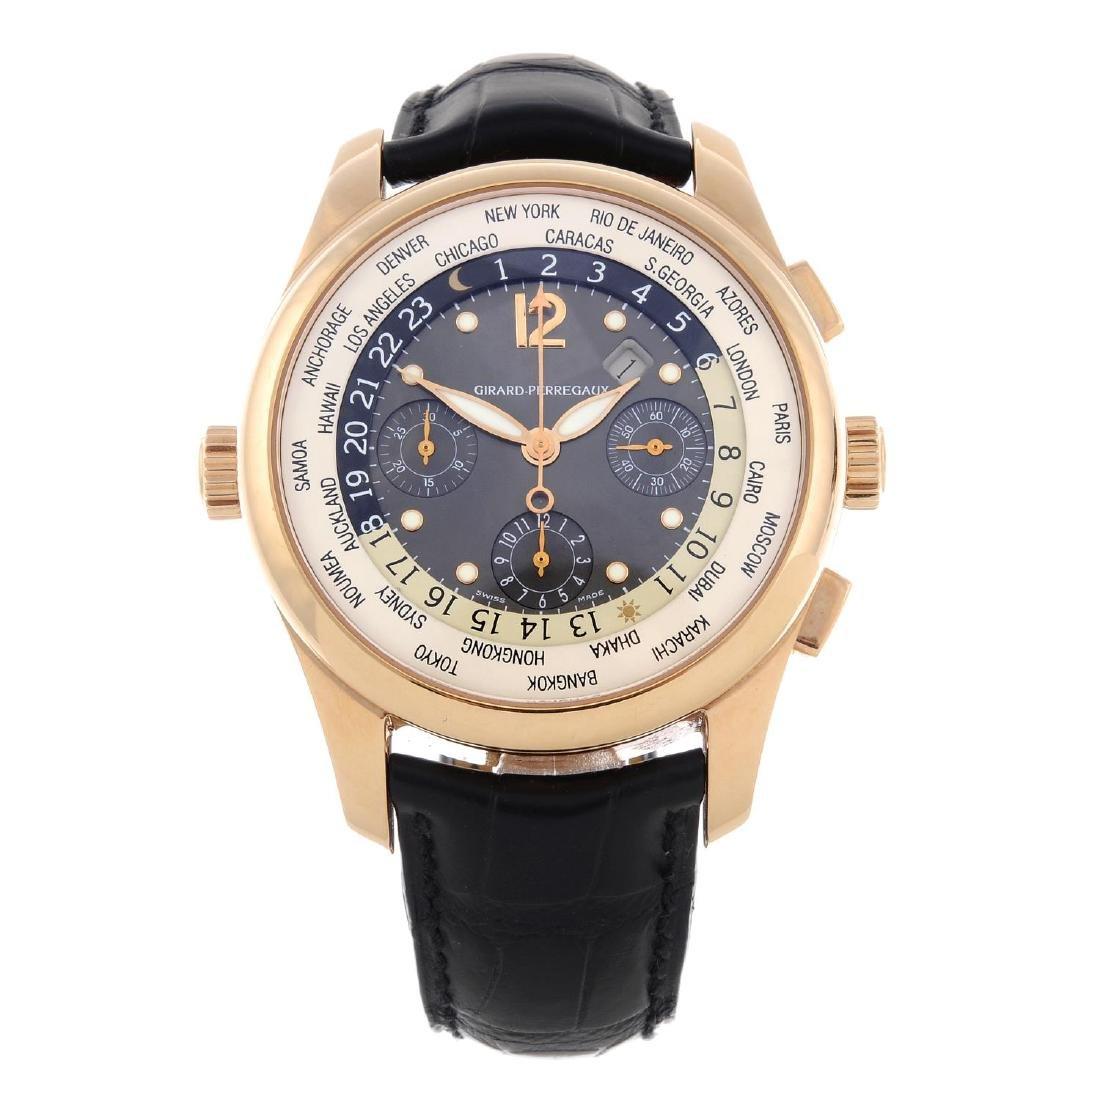 GIRARD-PERREGAUX - a gentleman's World Time chronograph